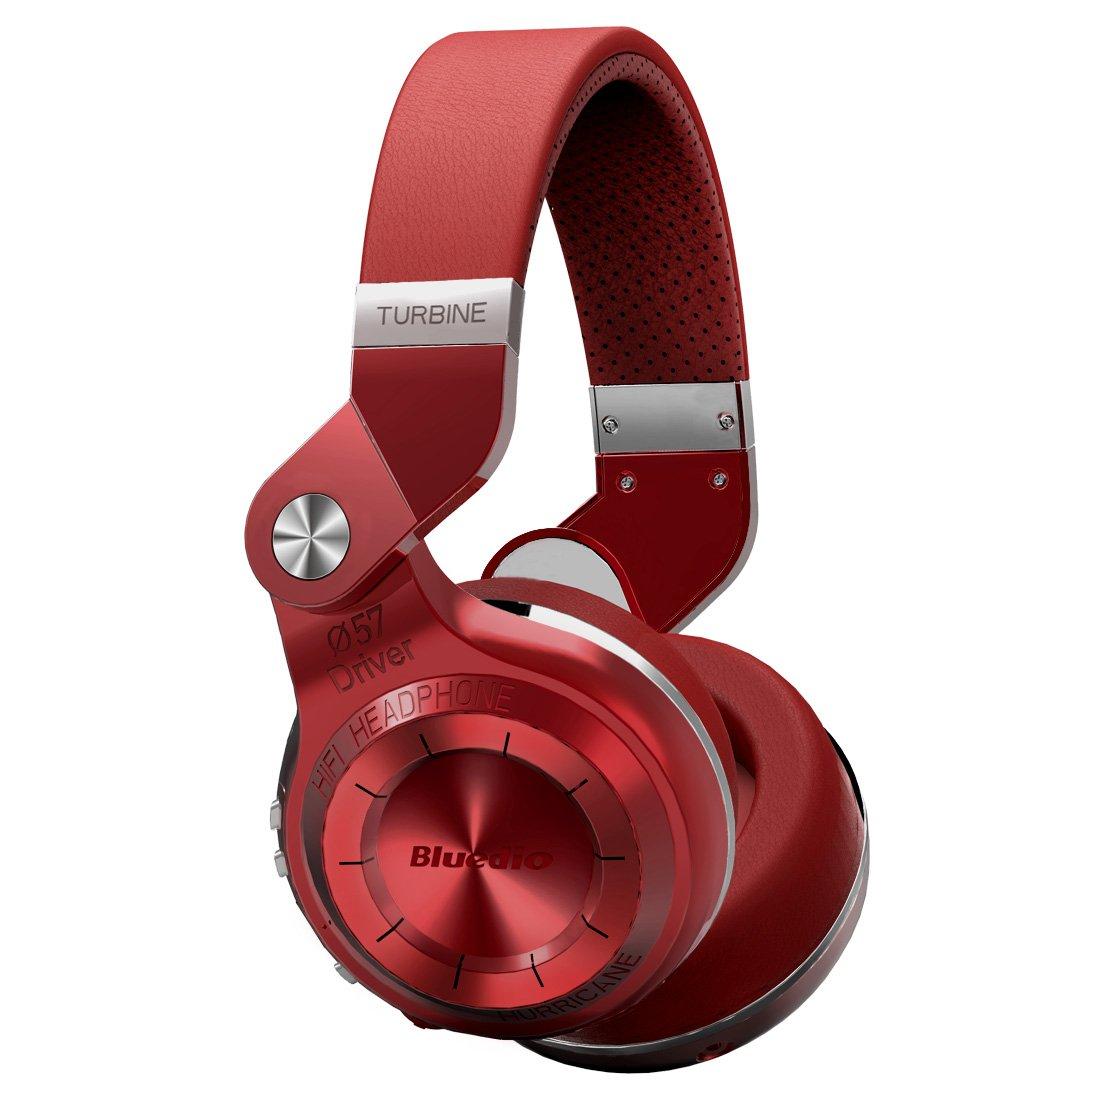 Lg bluetooth headphones white - headphones bluetooth long battery life